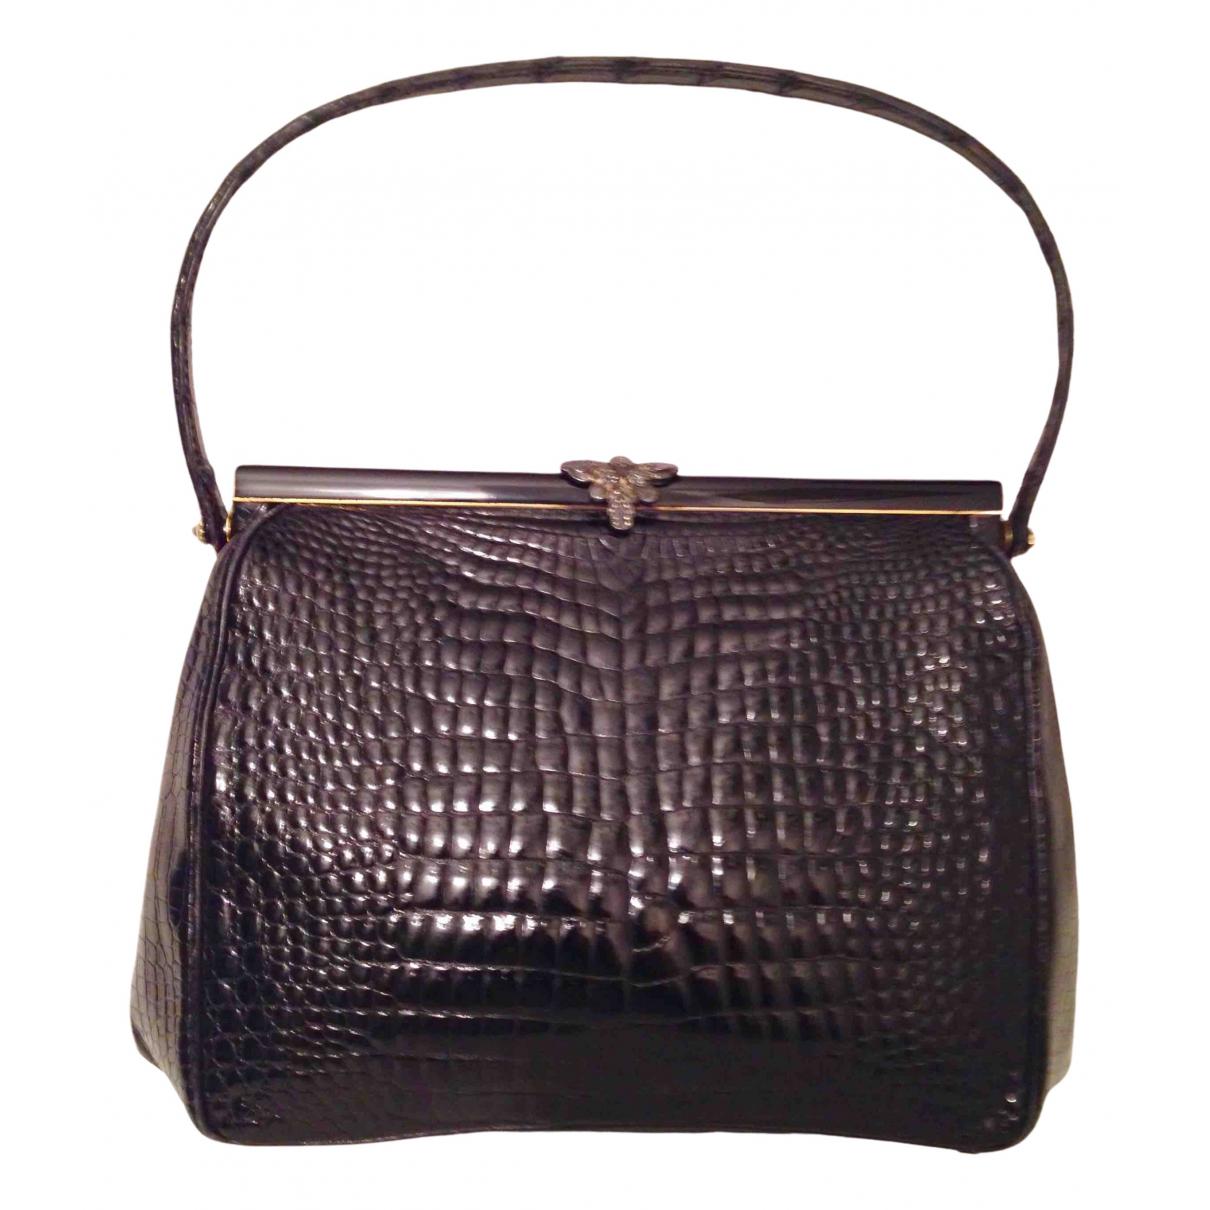 Alfred Dunhill N Brown Crocodile handbag for Women N